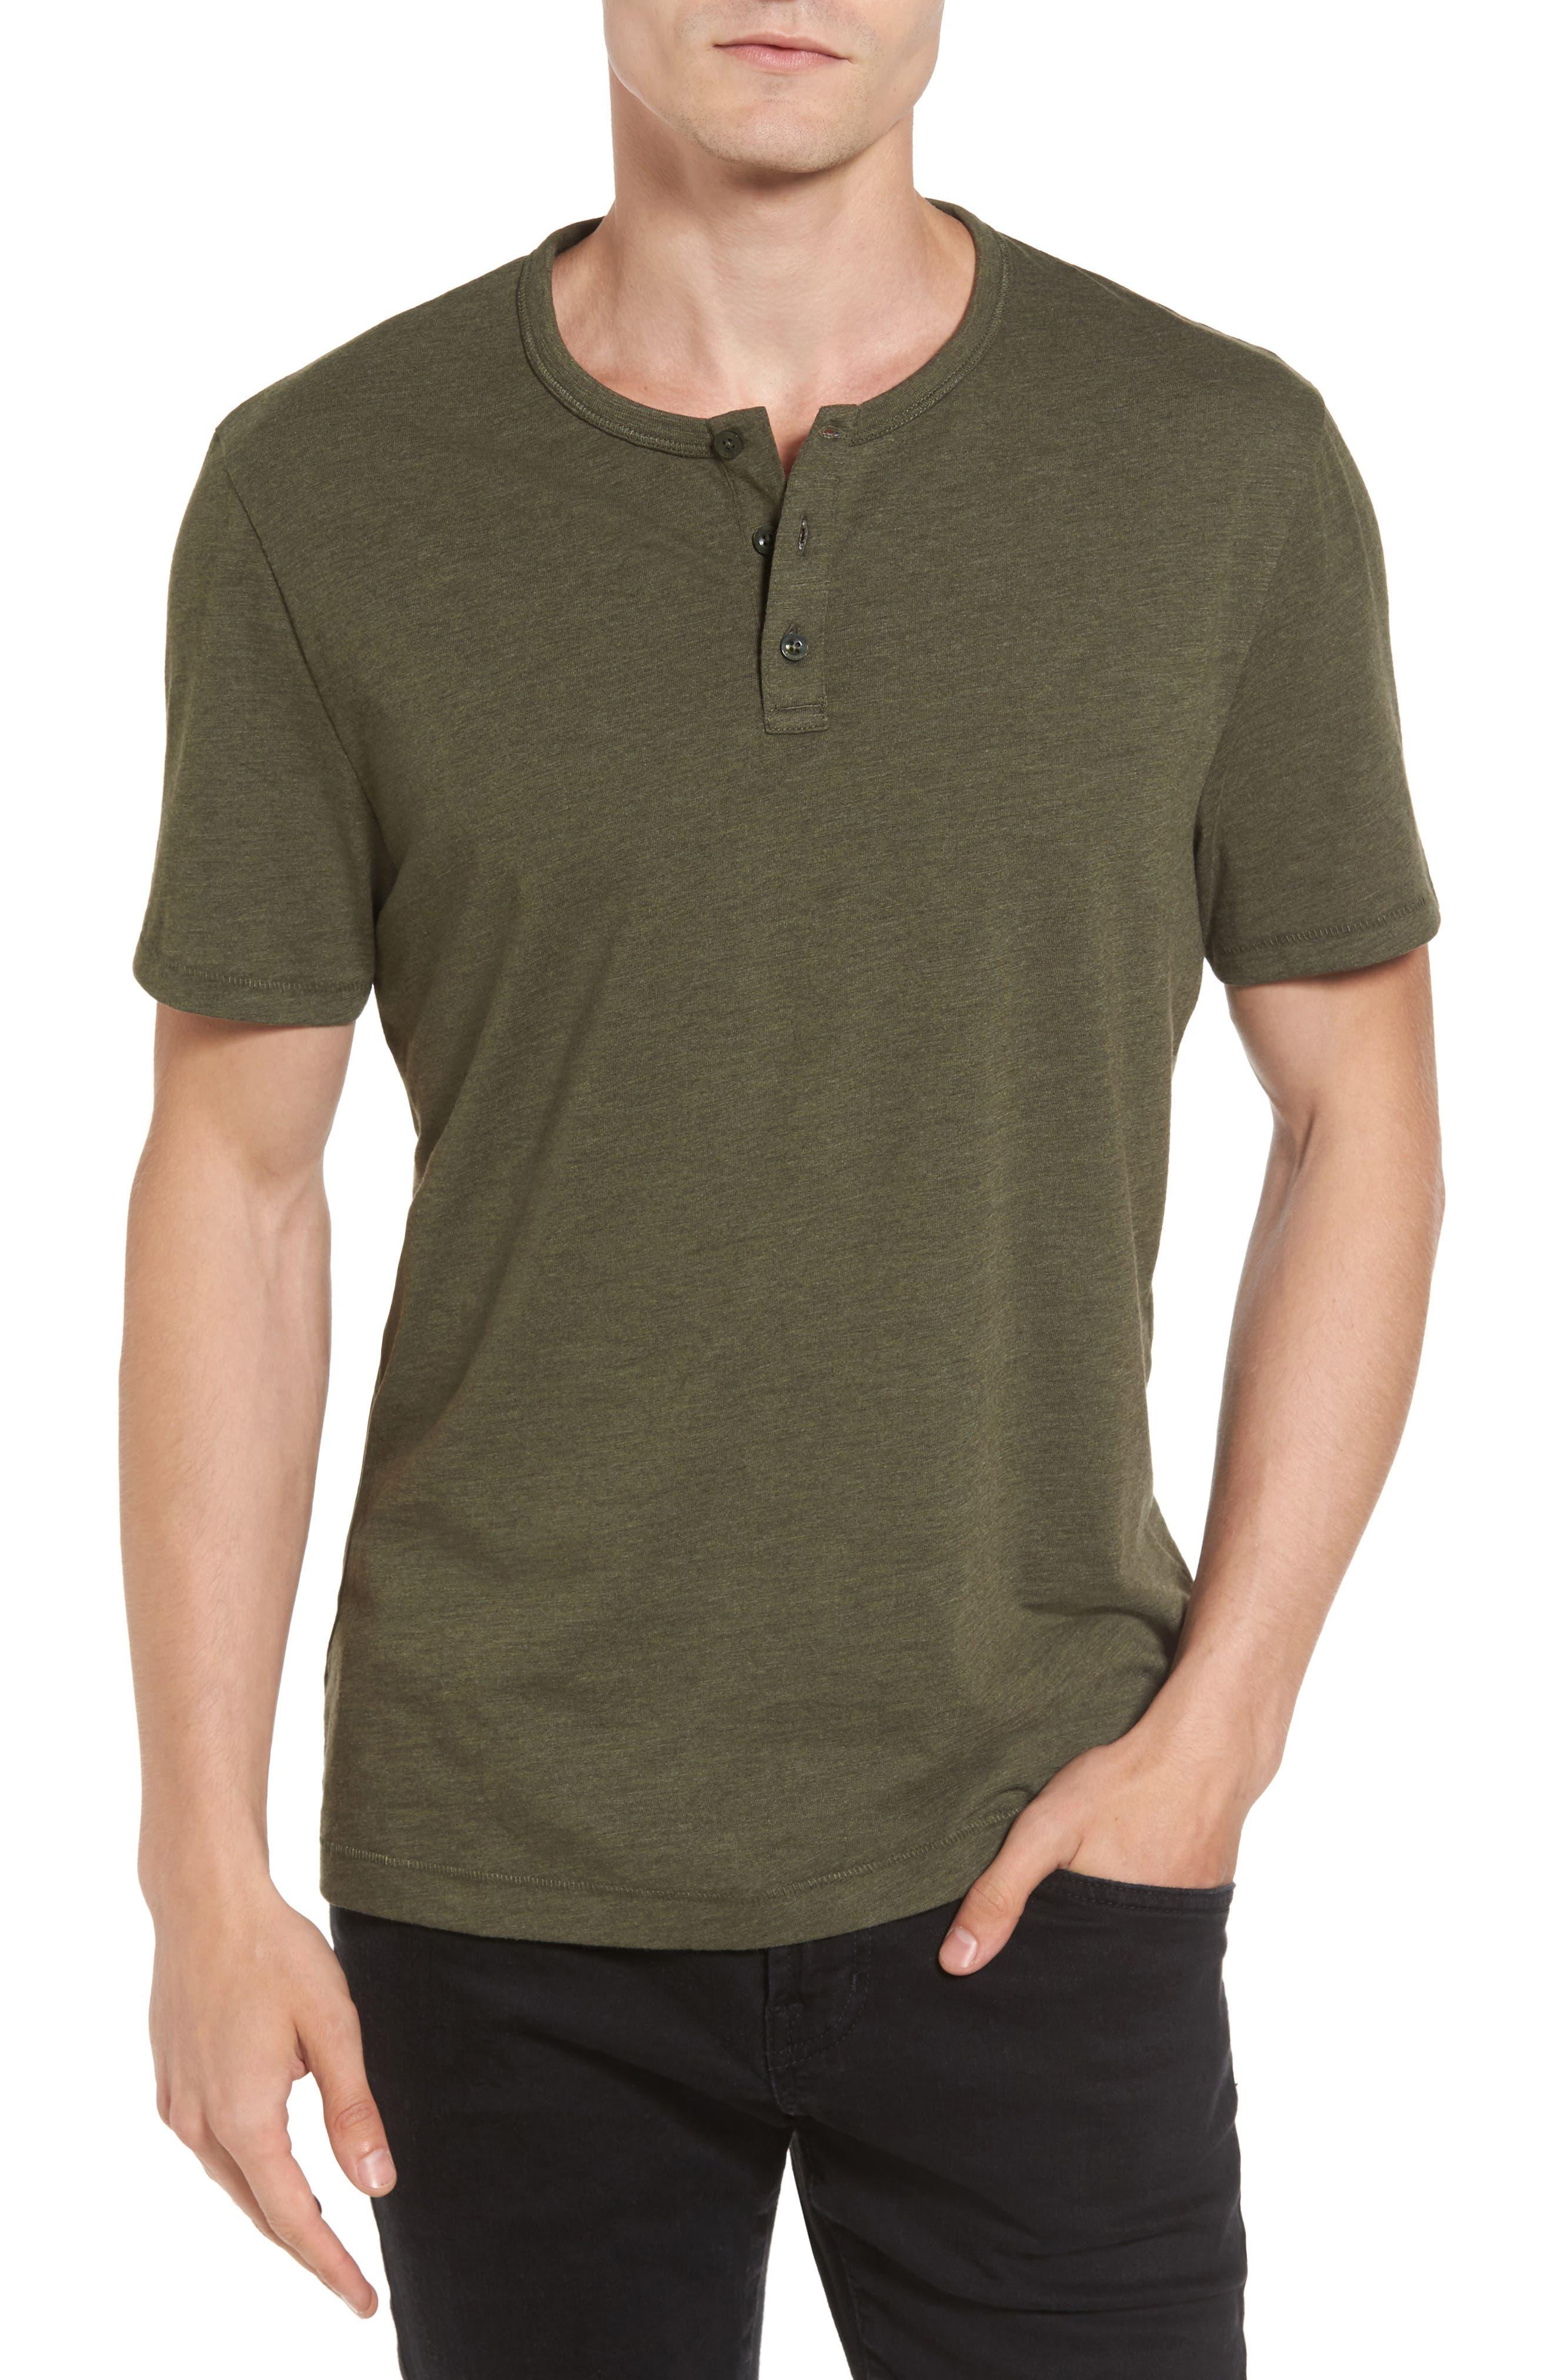 Bing Short Sleeve Henley Shirt,                         Main,                         color, 306